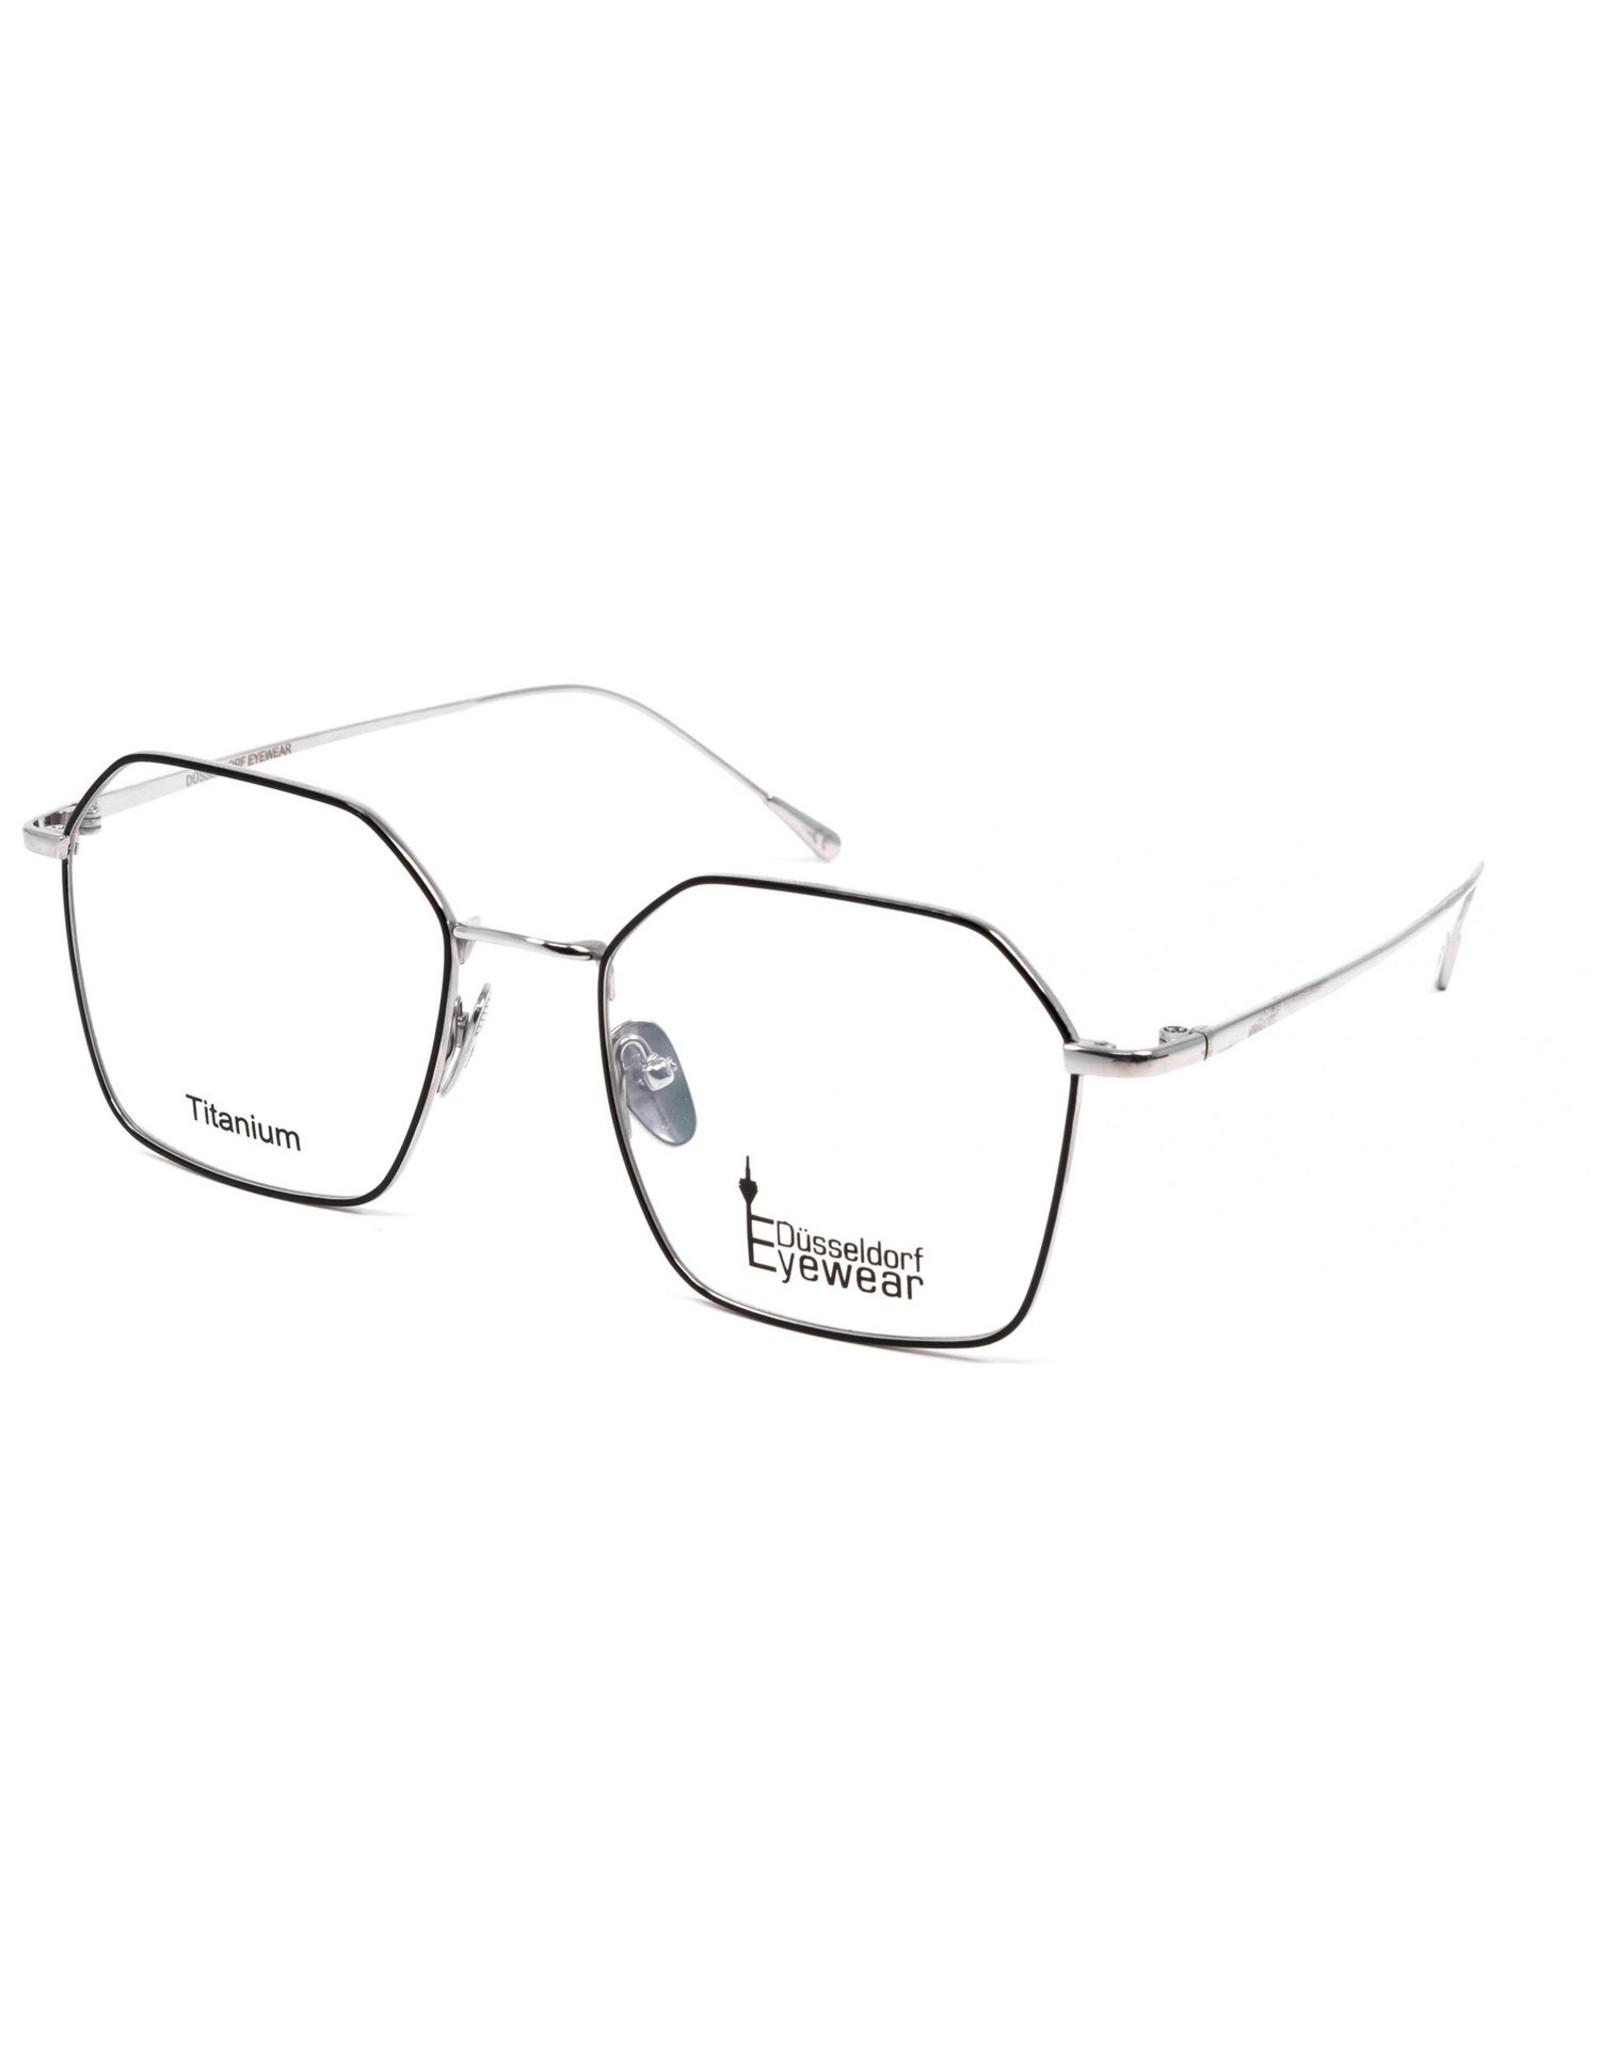 Dusselorf Eyewear Dusseldorf Eyewear Kennedeydam silver